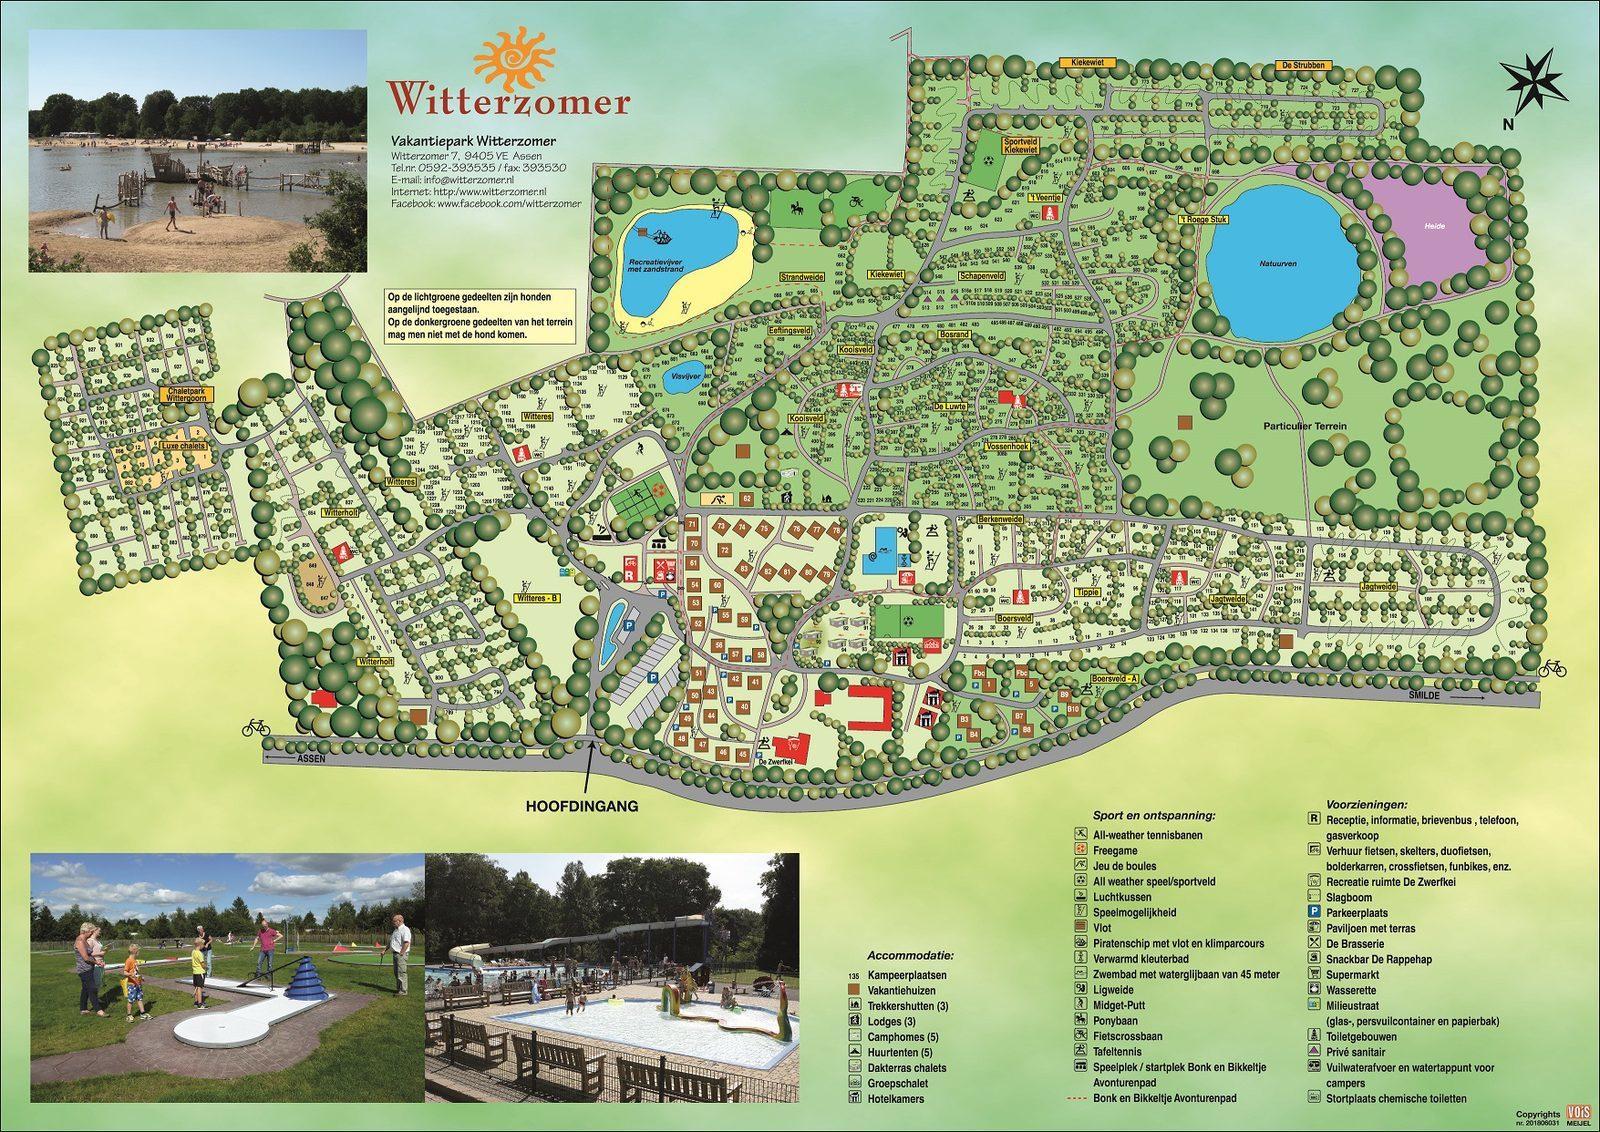 Plattegrond vakantiepark Witterzomer